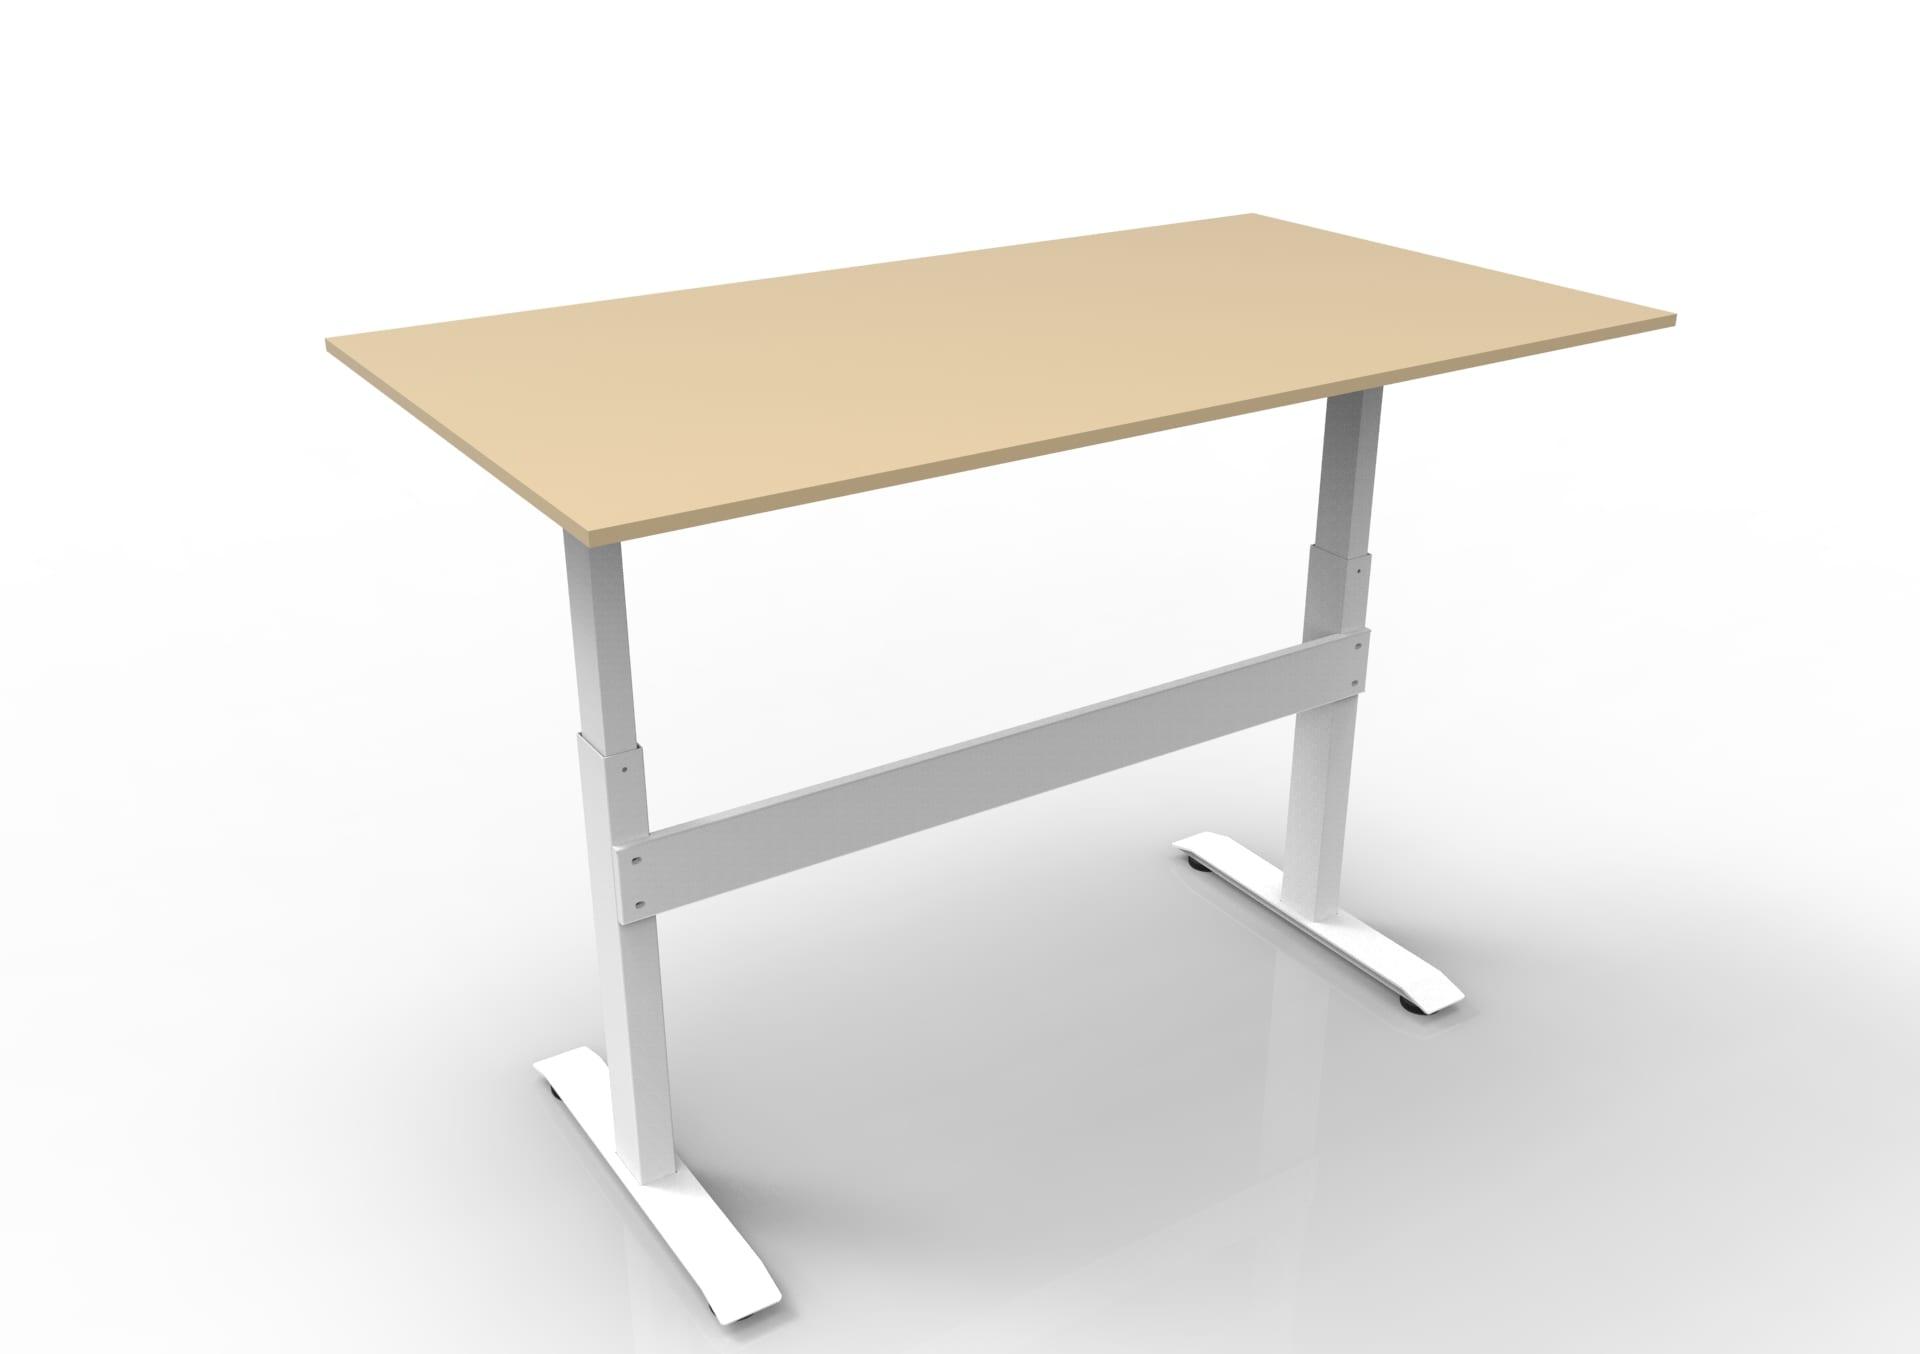 gdf02mw gas spring height adjustable standing desk w/ beige top